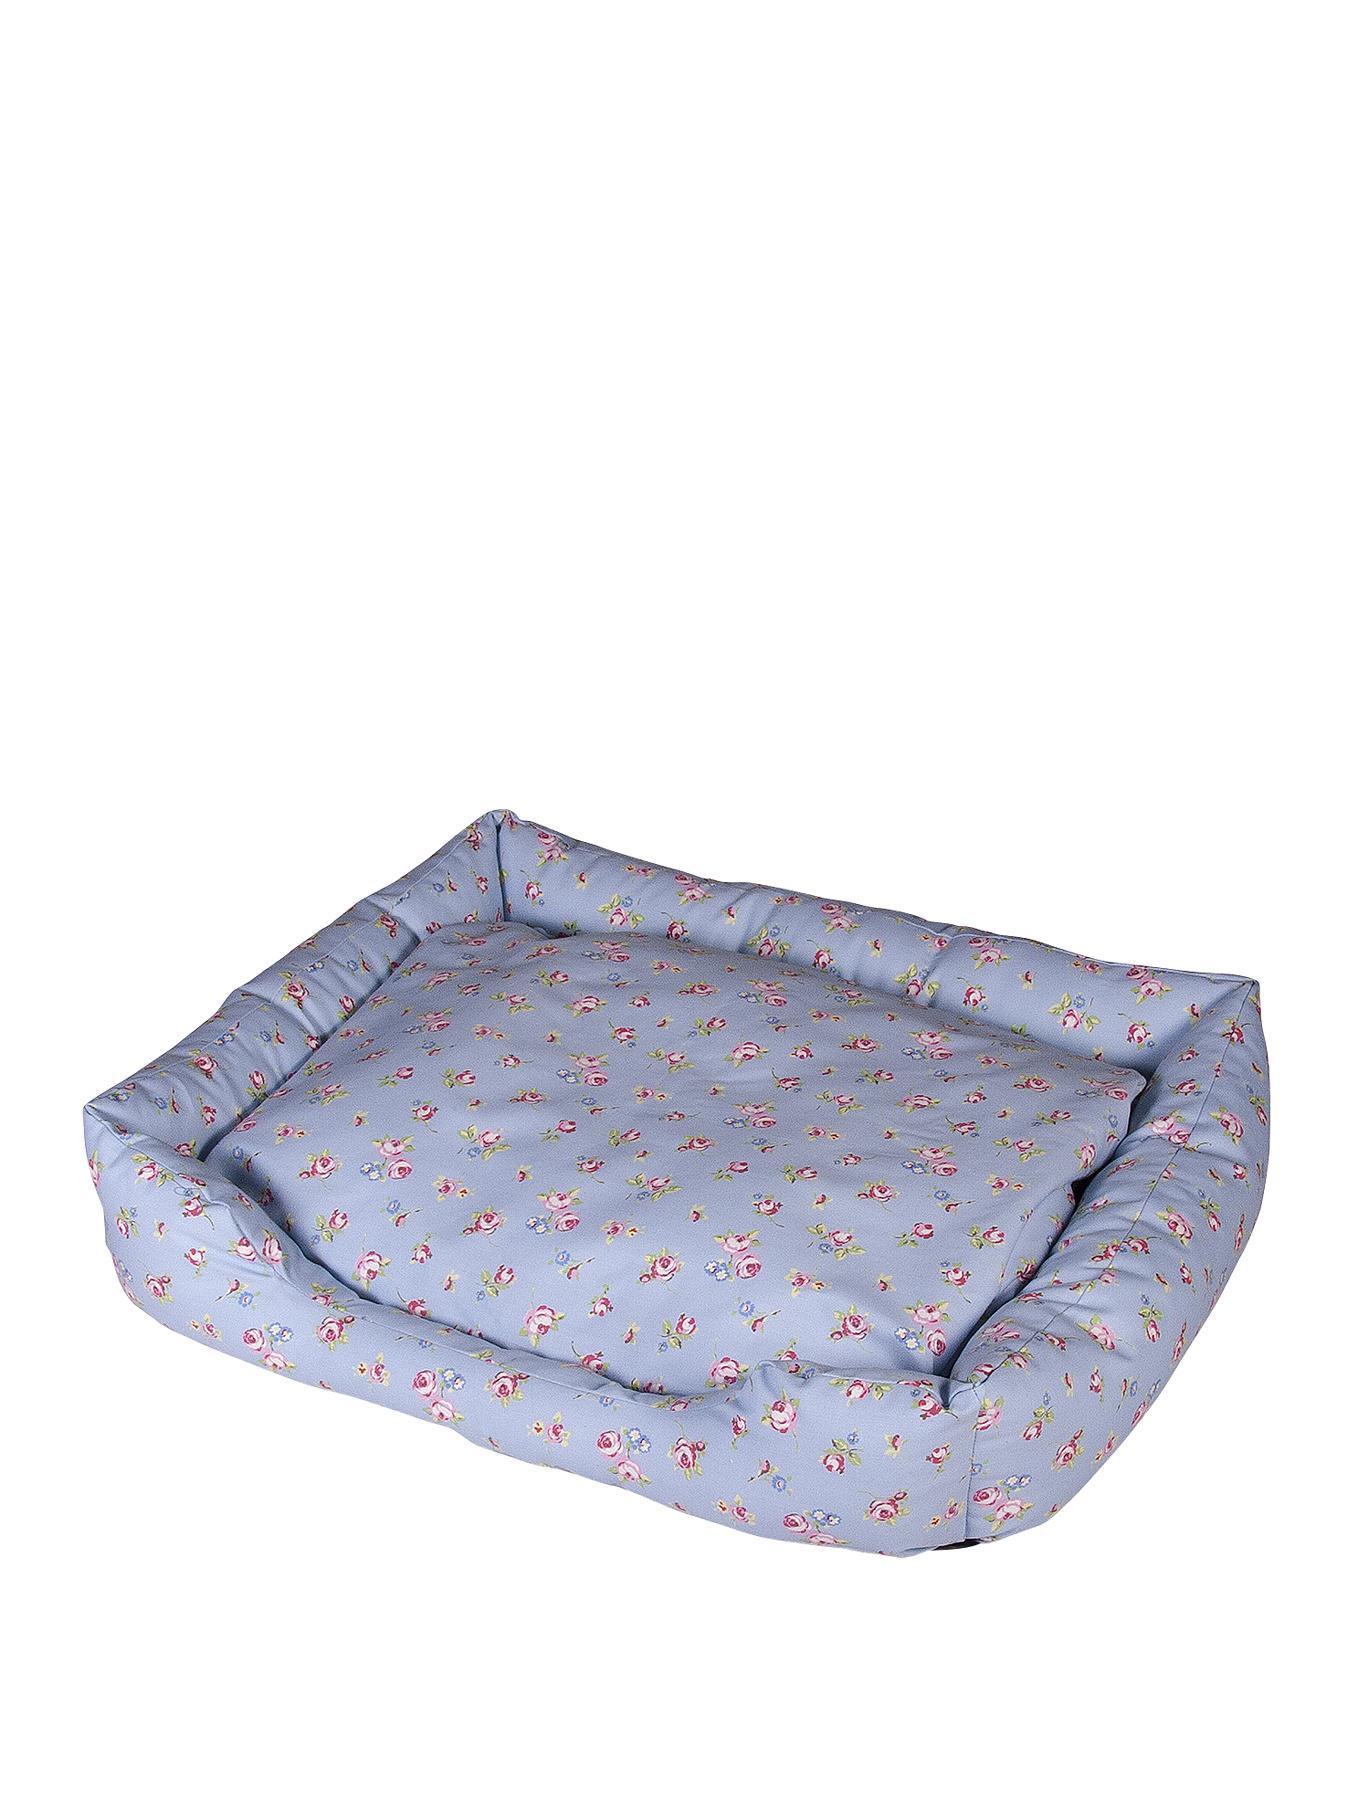 Floral Print Pet Bed